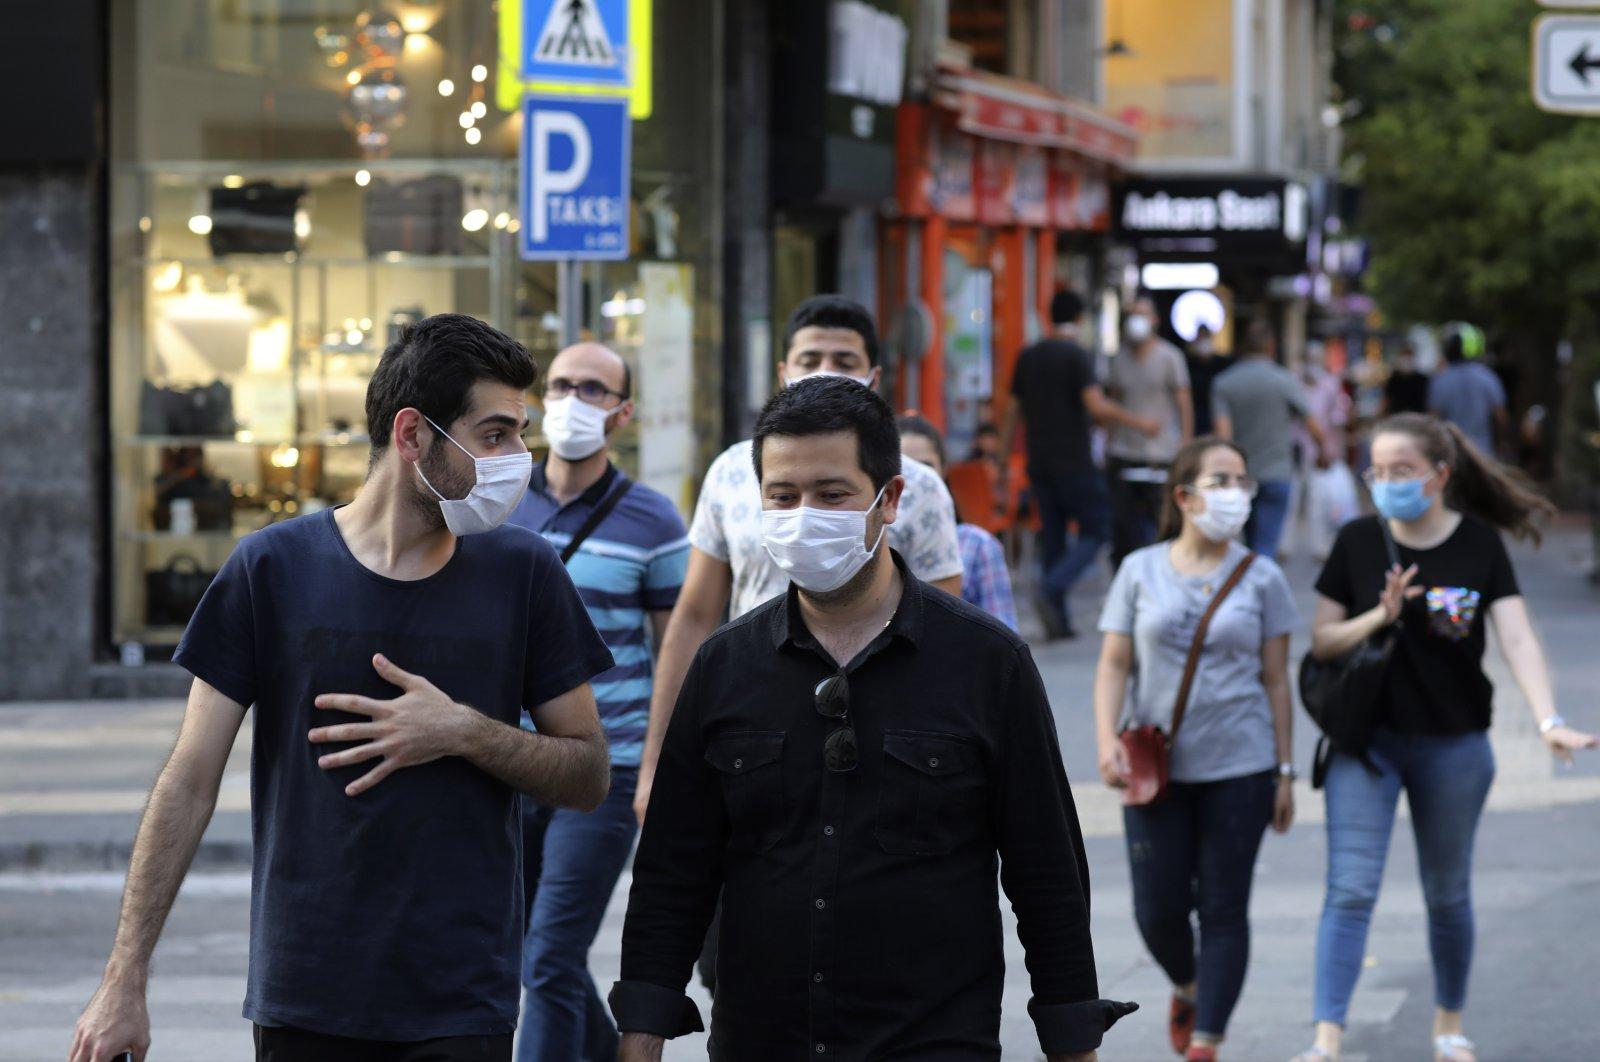 People wearing face masks walk in the capital Ankara, Turkey, Aug. 6, 2020. (AP Photo)